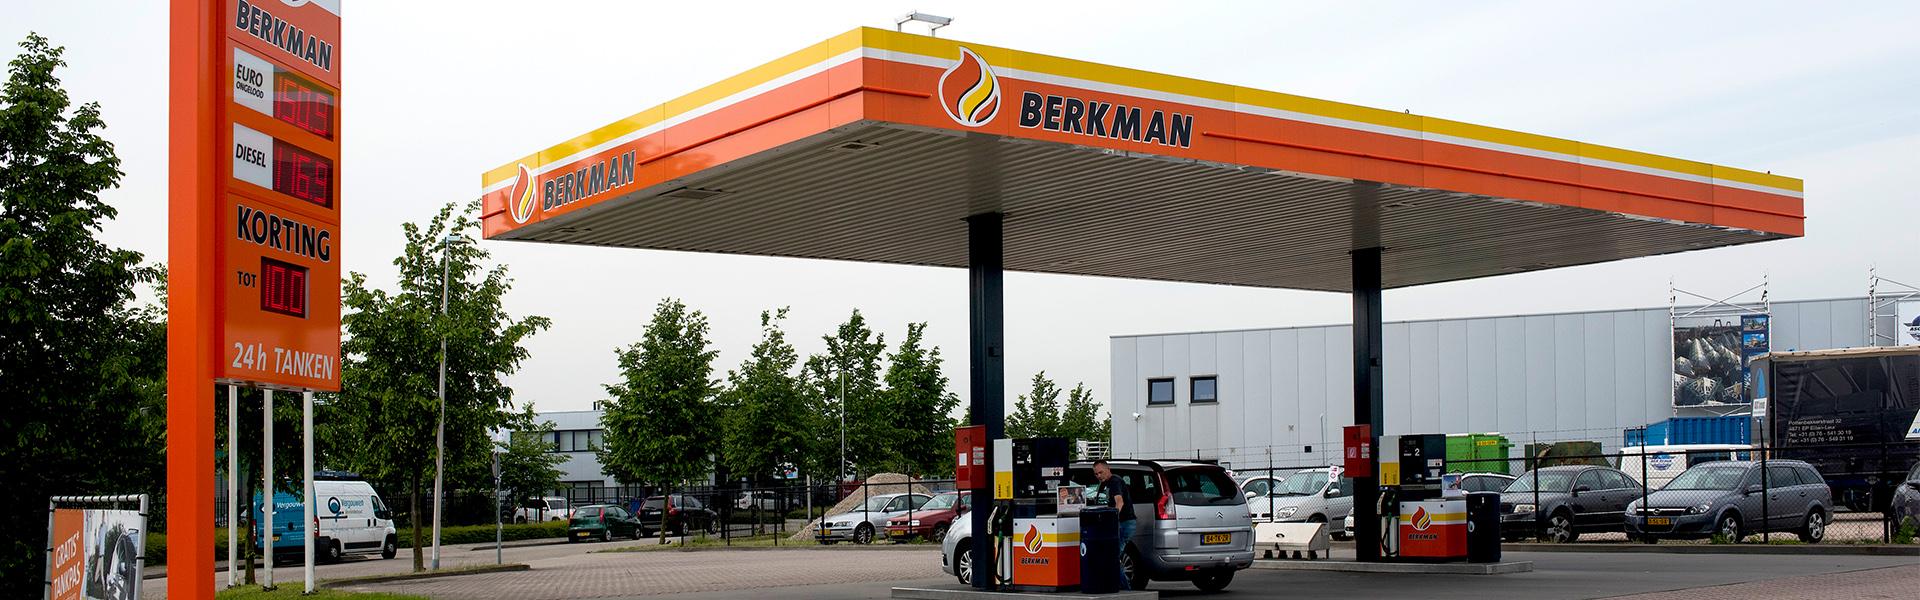 Berkman tankstation